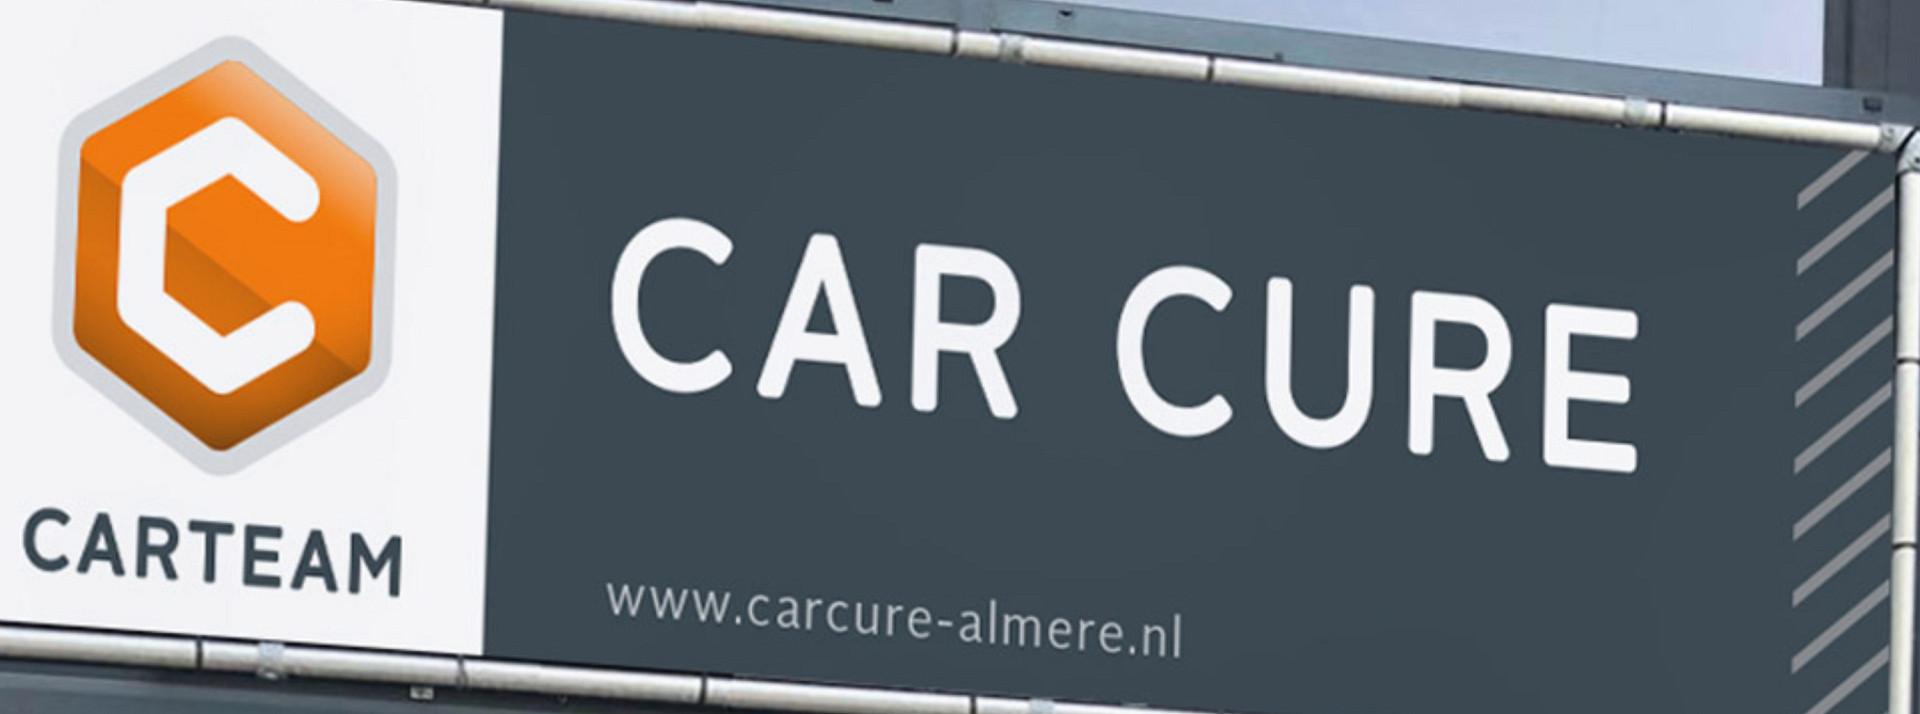 Carteam Car Cure